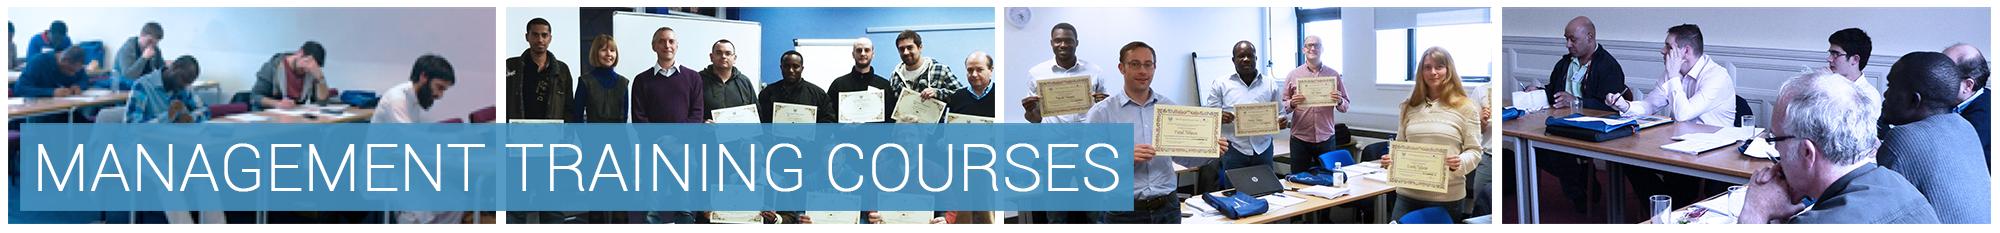 ECT Management Training Courses